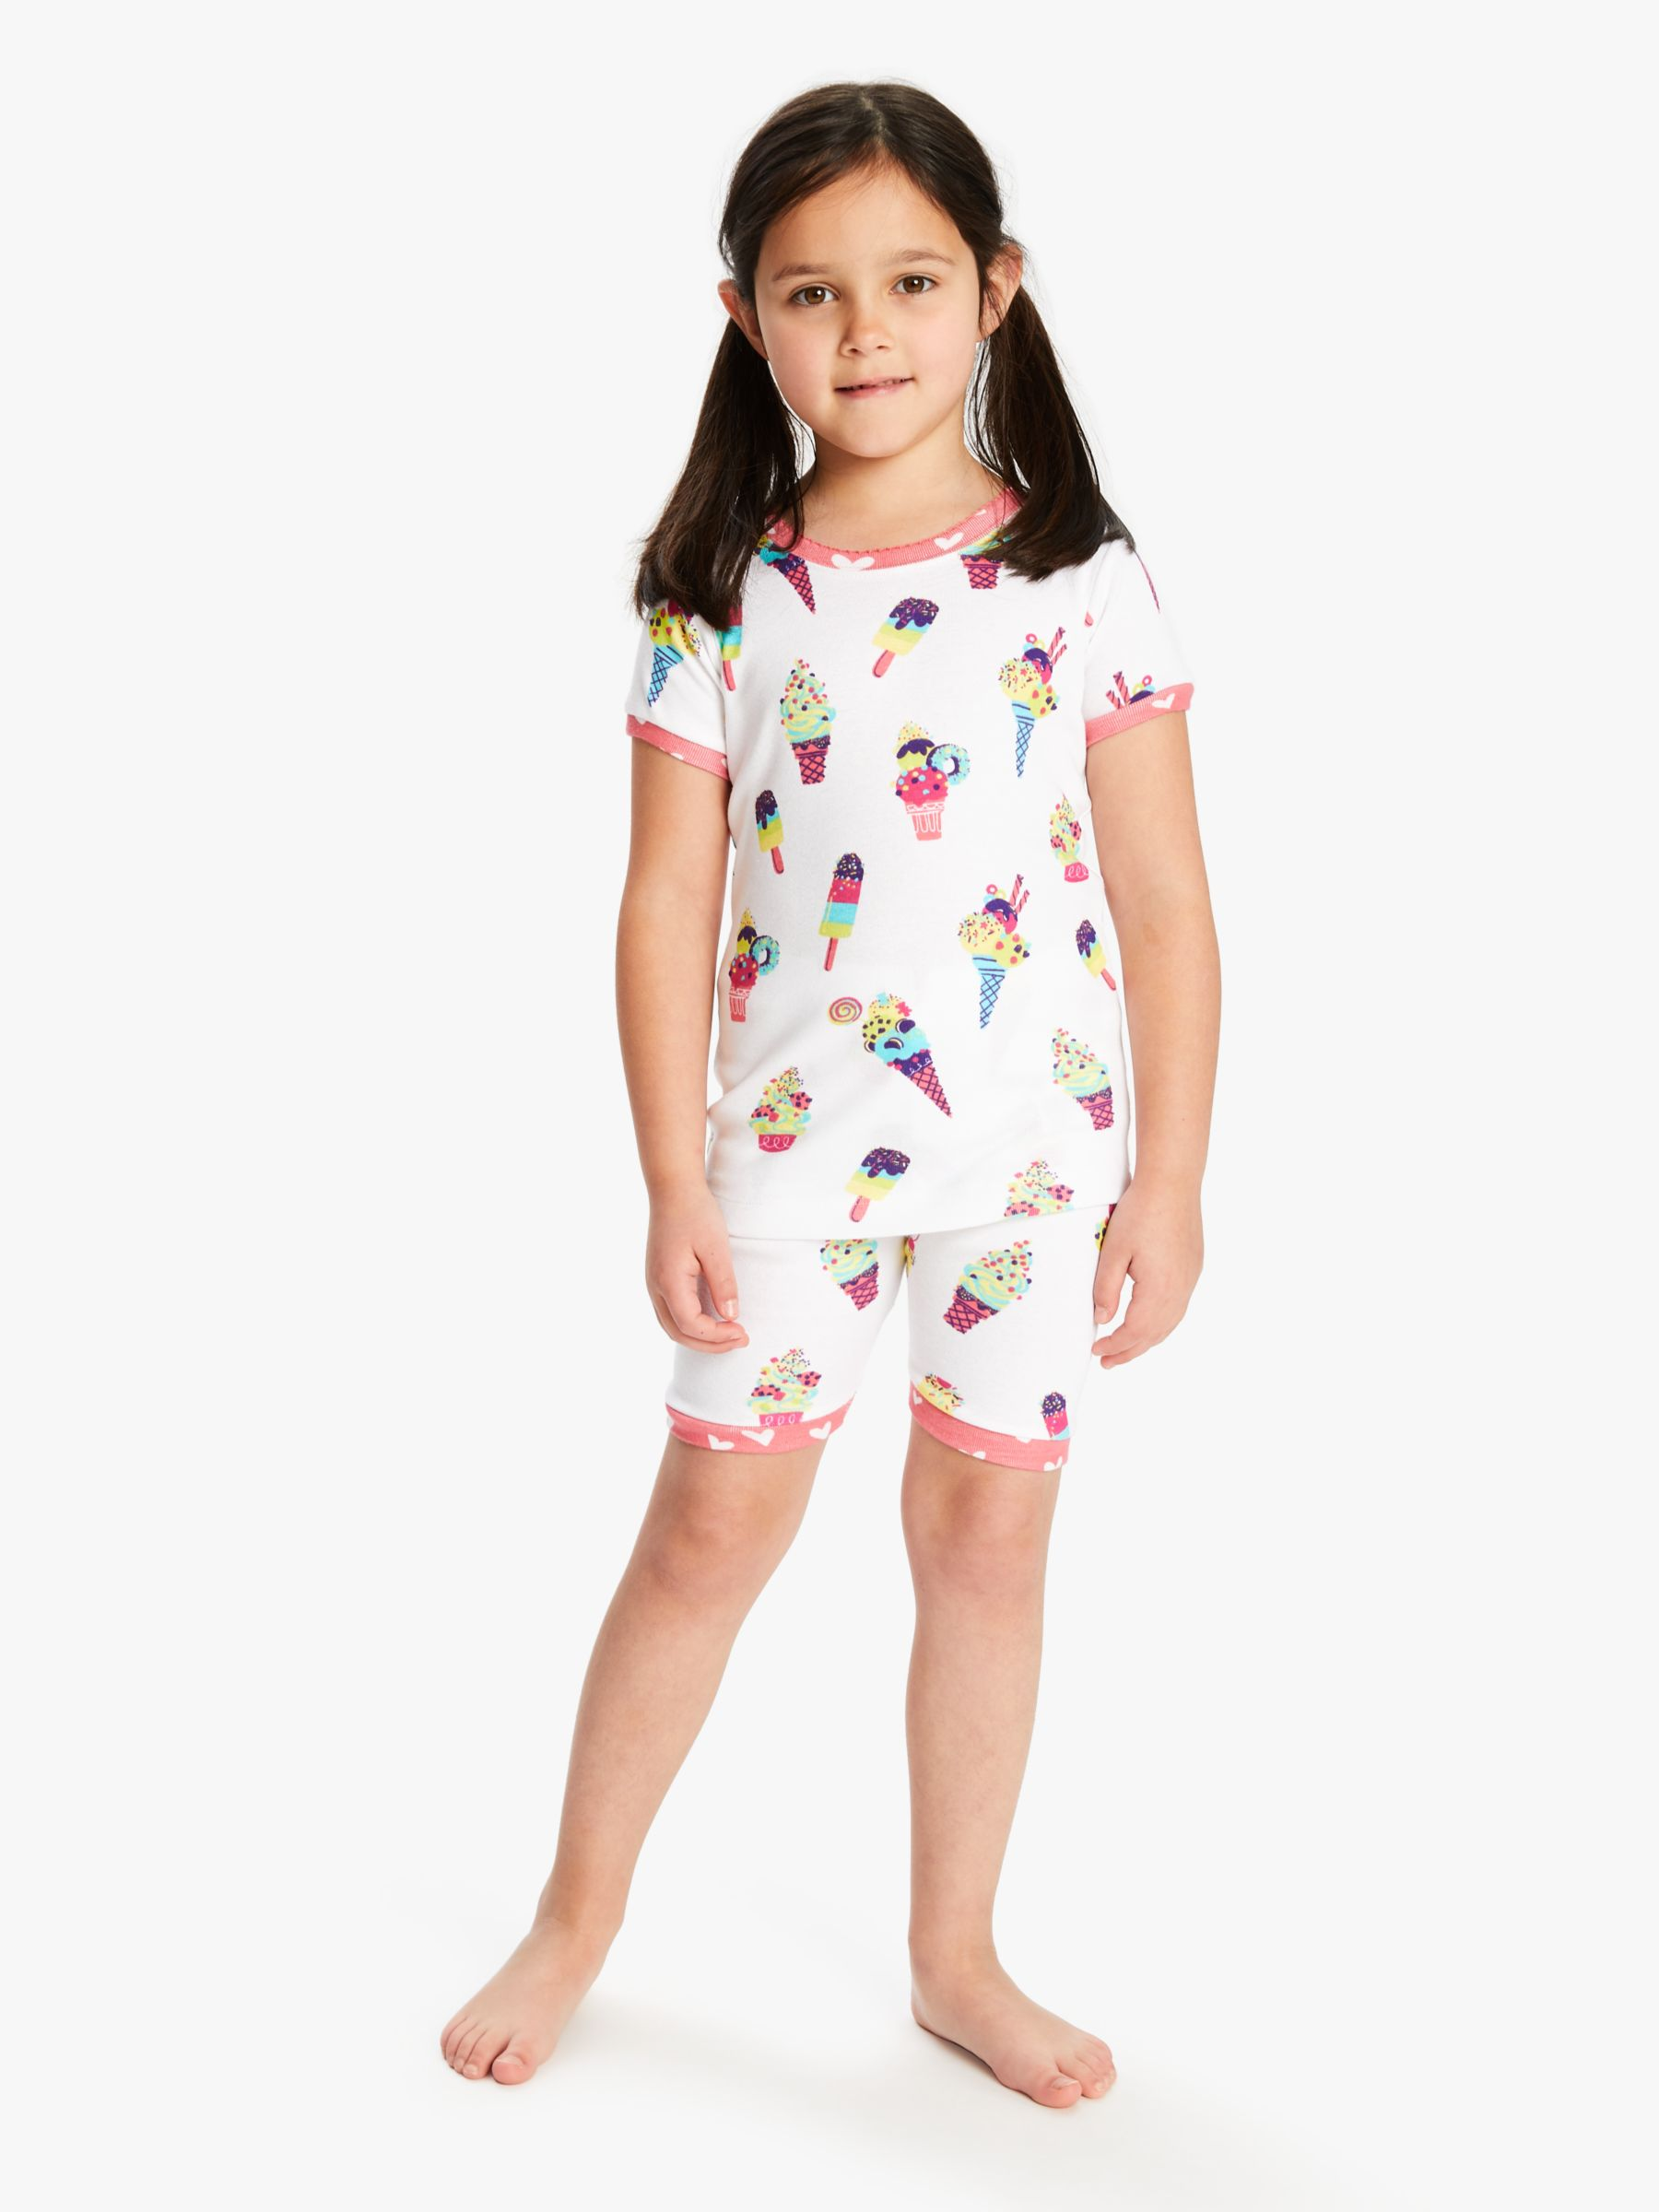 Hatley Hatley Girls' Ice Cream Print Short Pyjamas, White